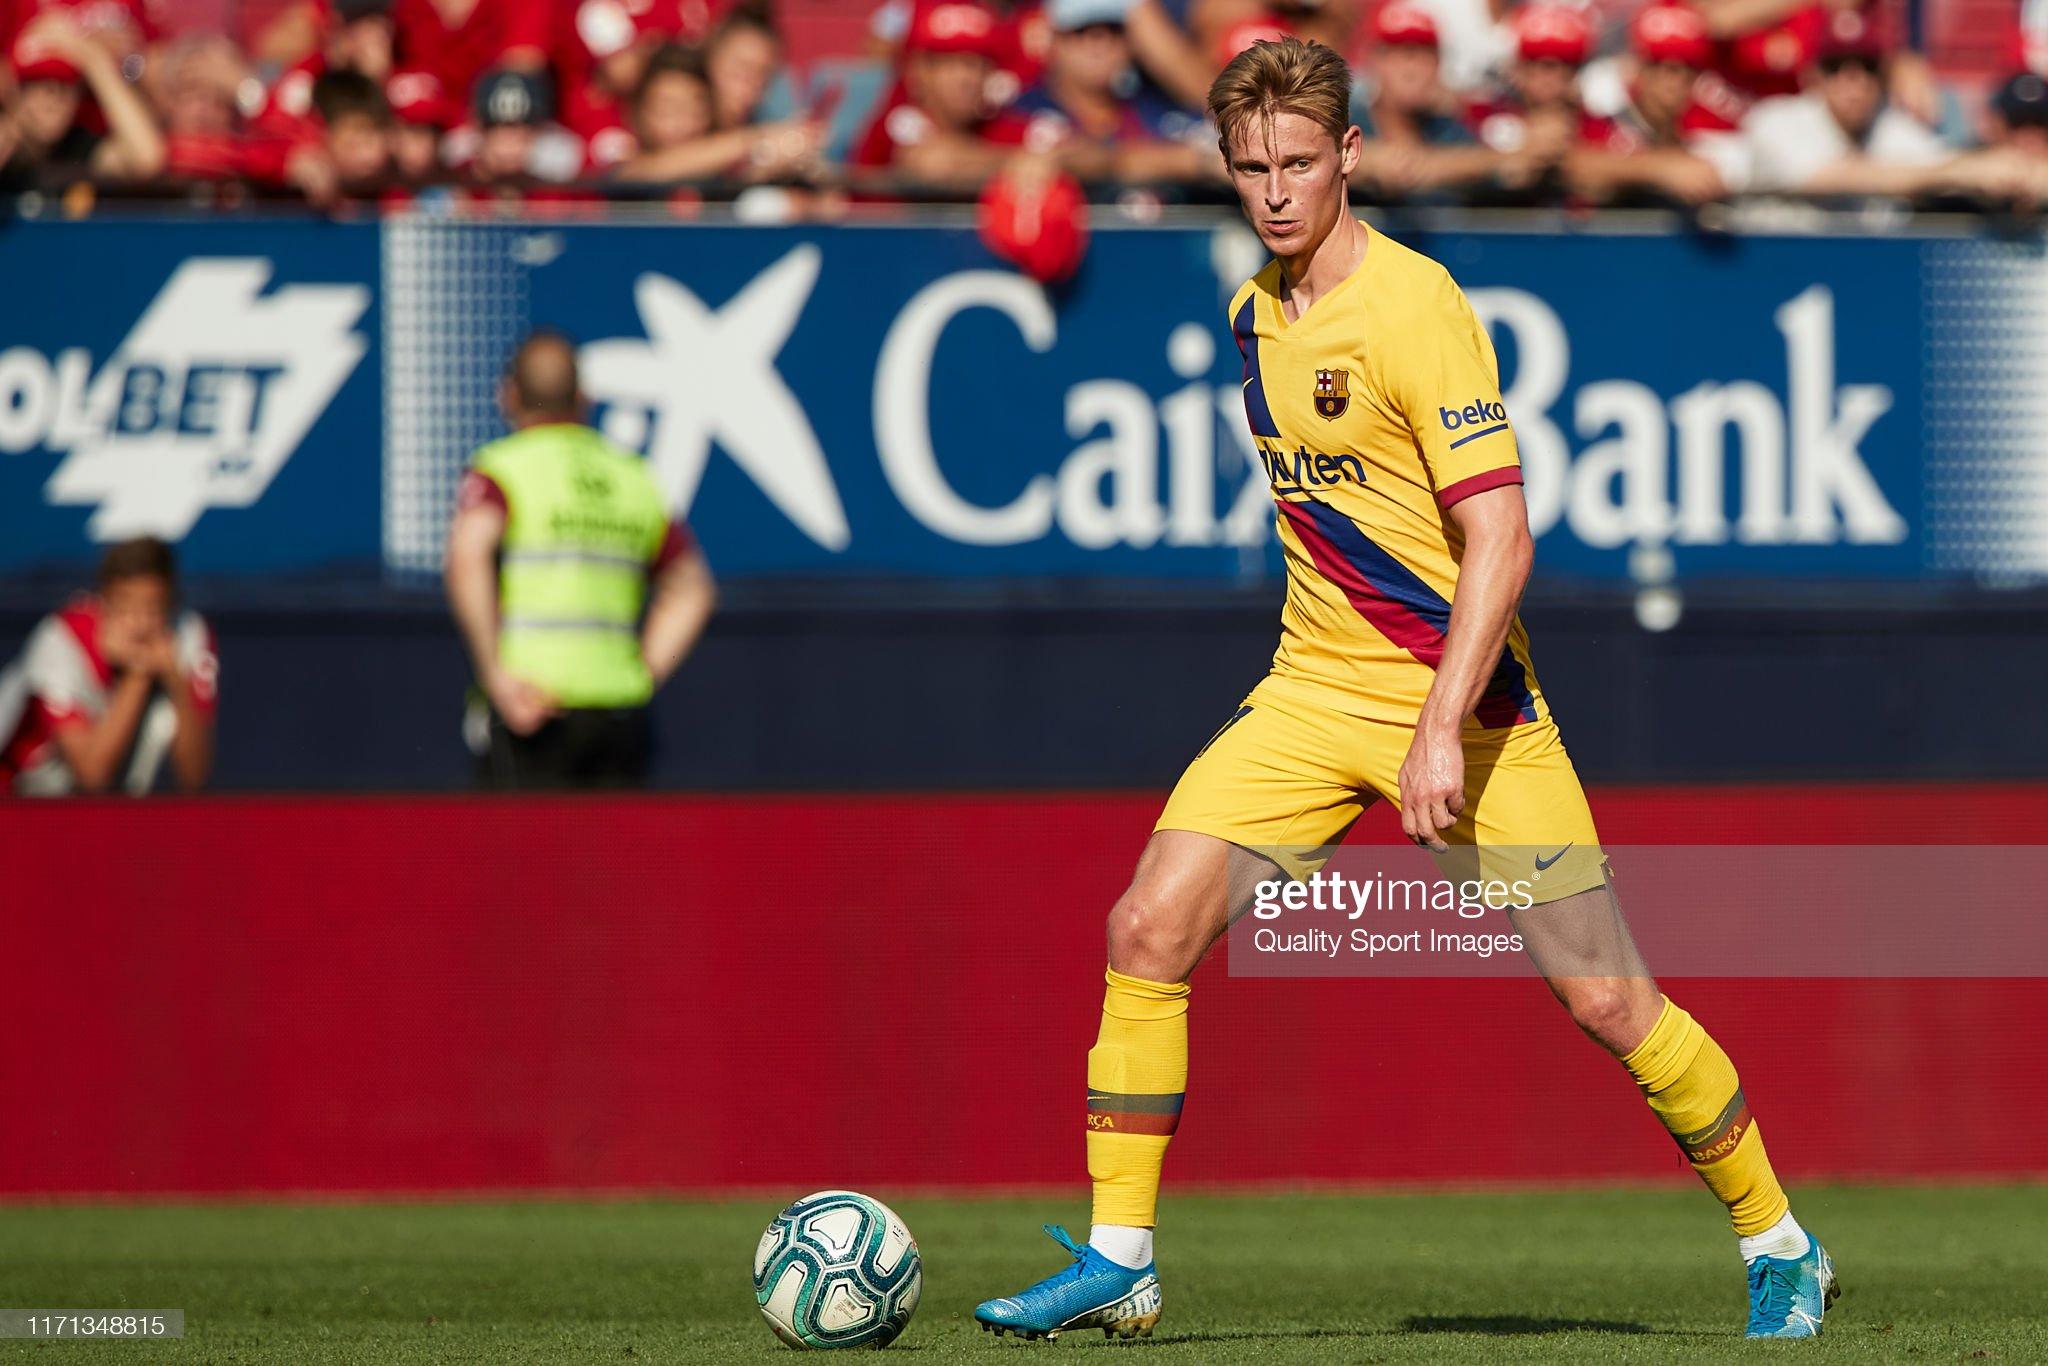 صور مباراة : أوساسونا - برشلونة 2-2 ( 31-08-2019 )  Frenkie-de-jong-of-fc-barcelona-in-action-during-the-liga-match-ca-picture-id1171348815?s=2048x2048